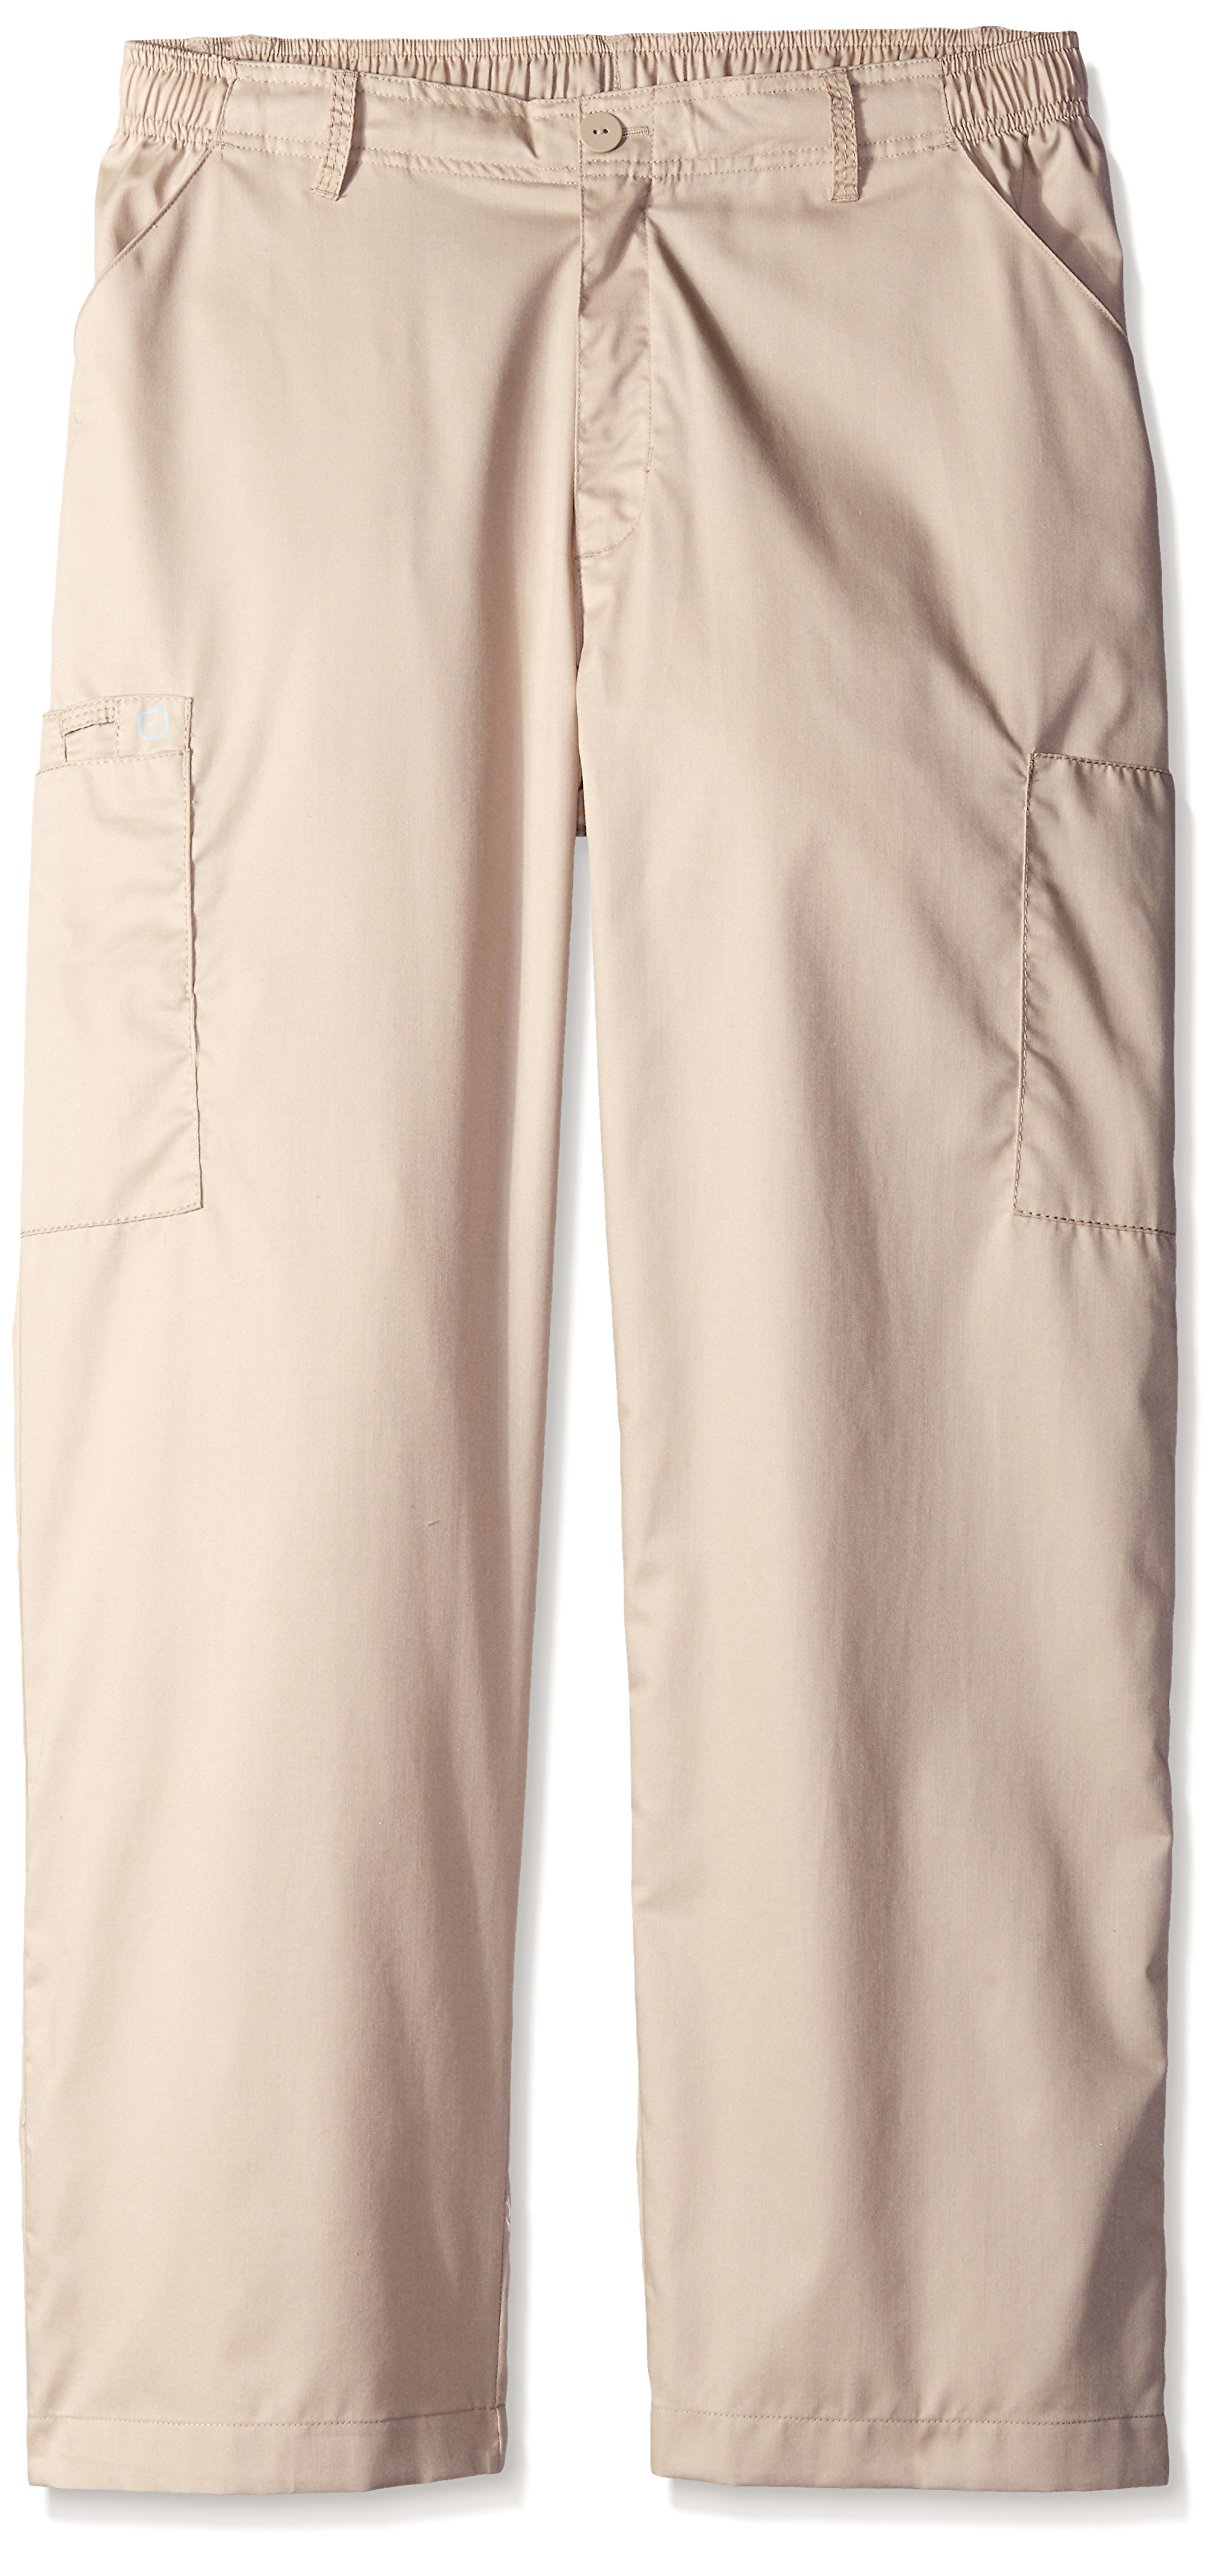 WonderWink Men's Petite Wonderwork Cargo Pant Short, Khaki, Medium